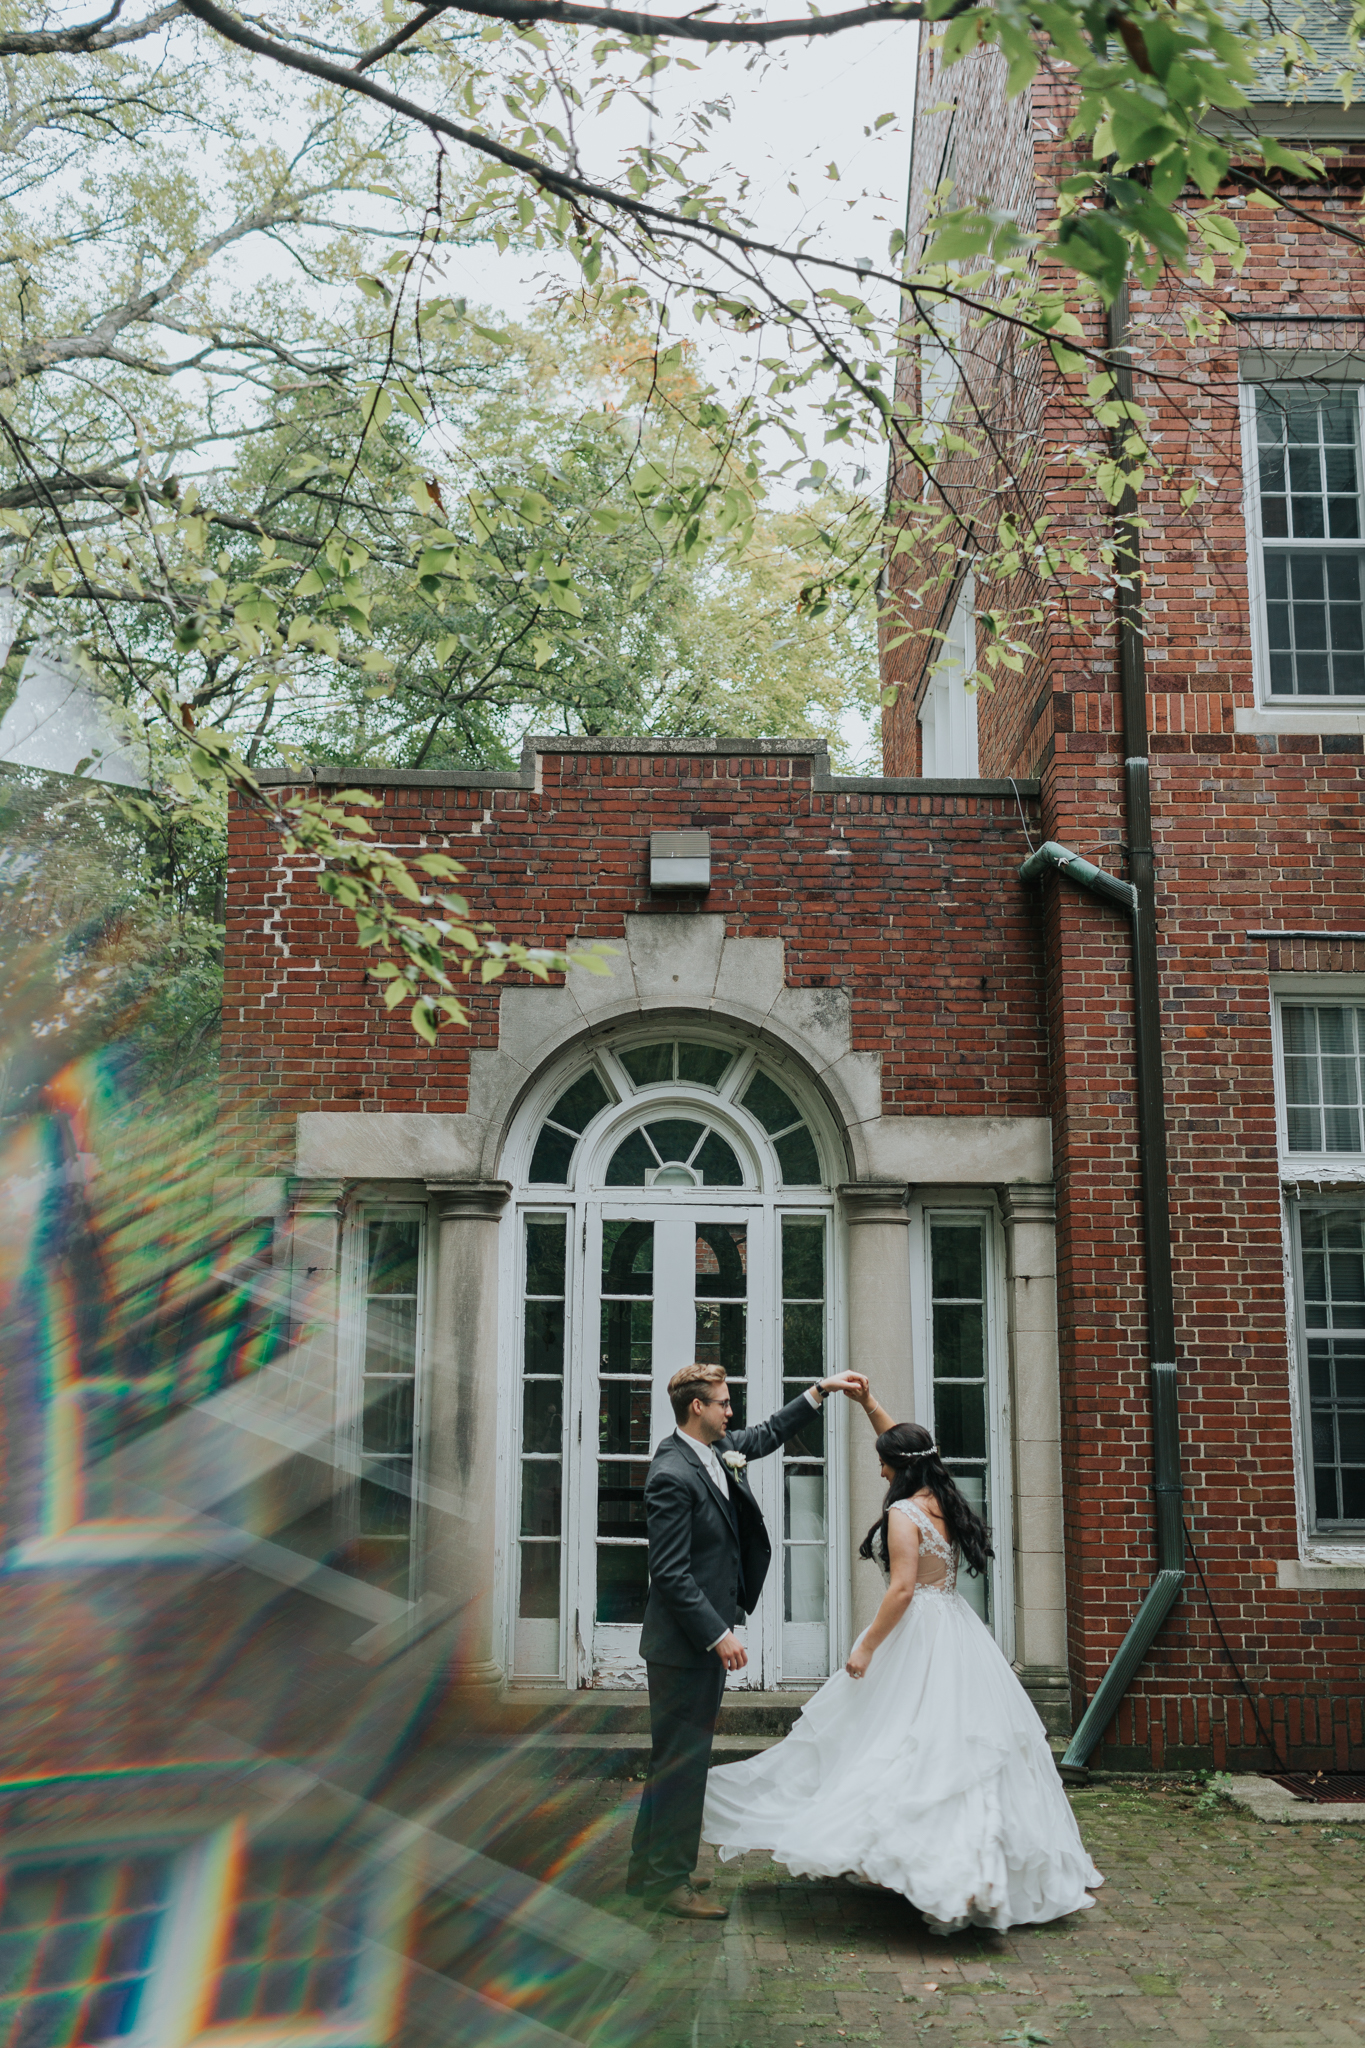 couple dancing in courtyard